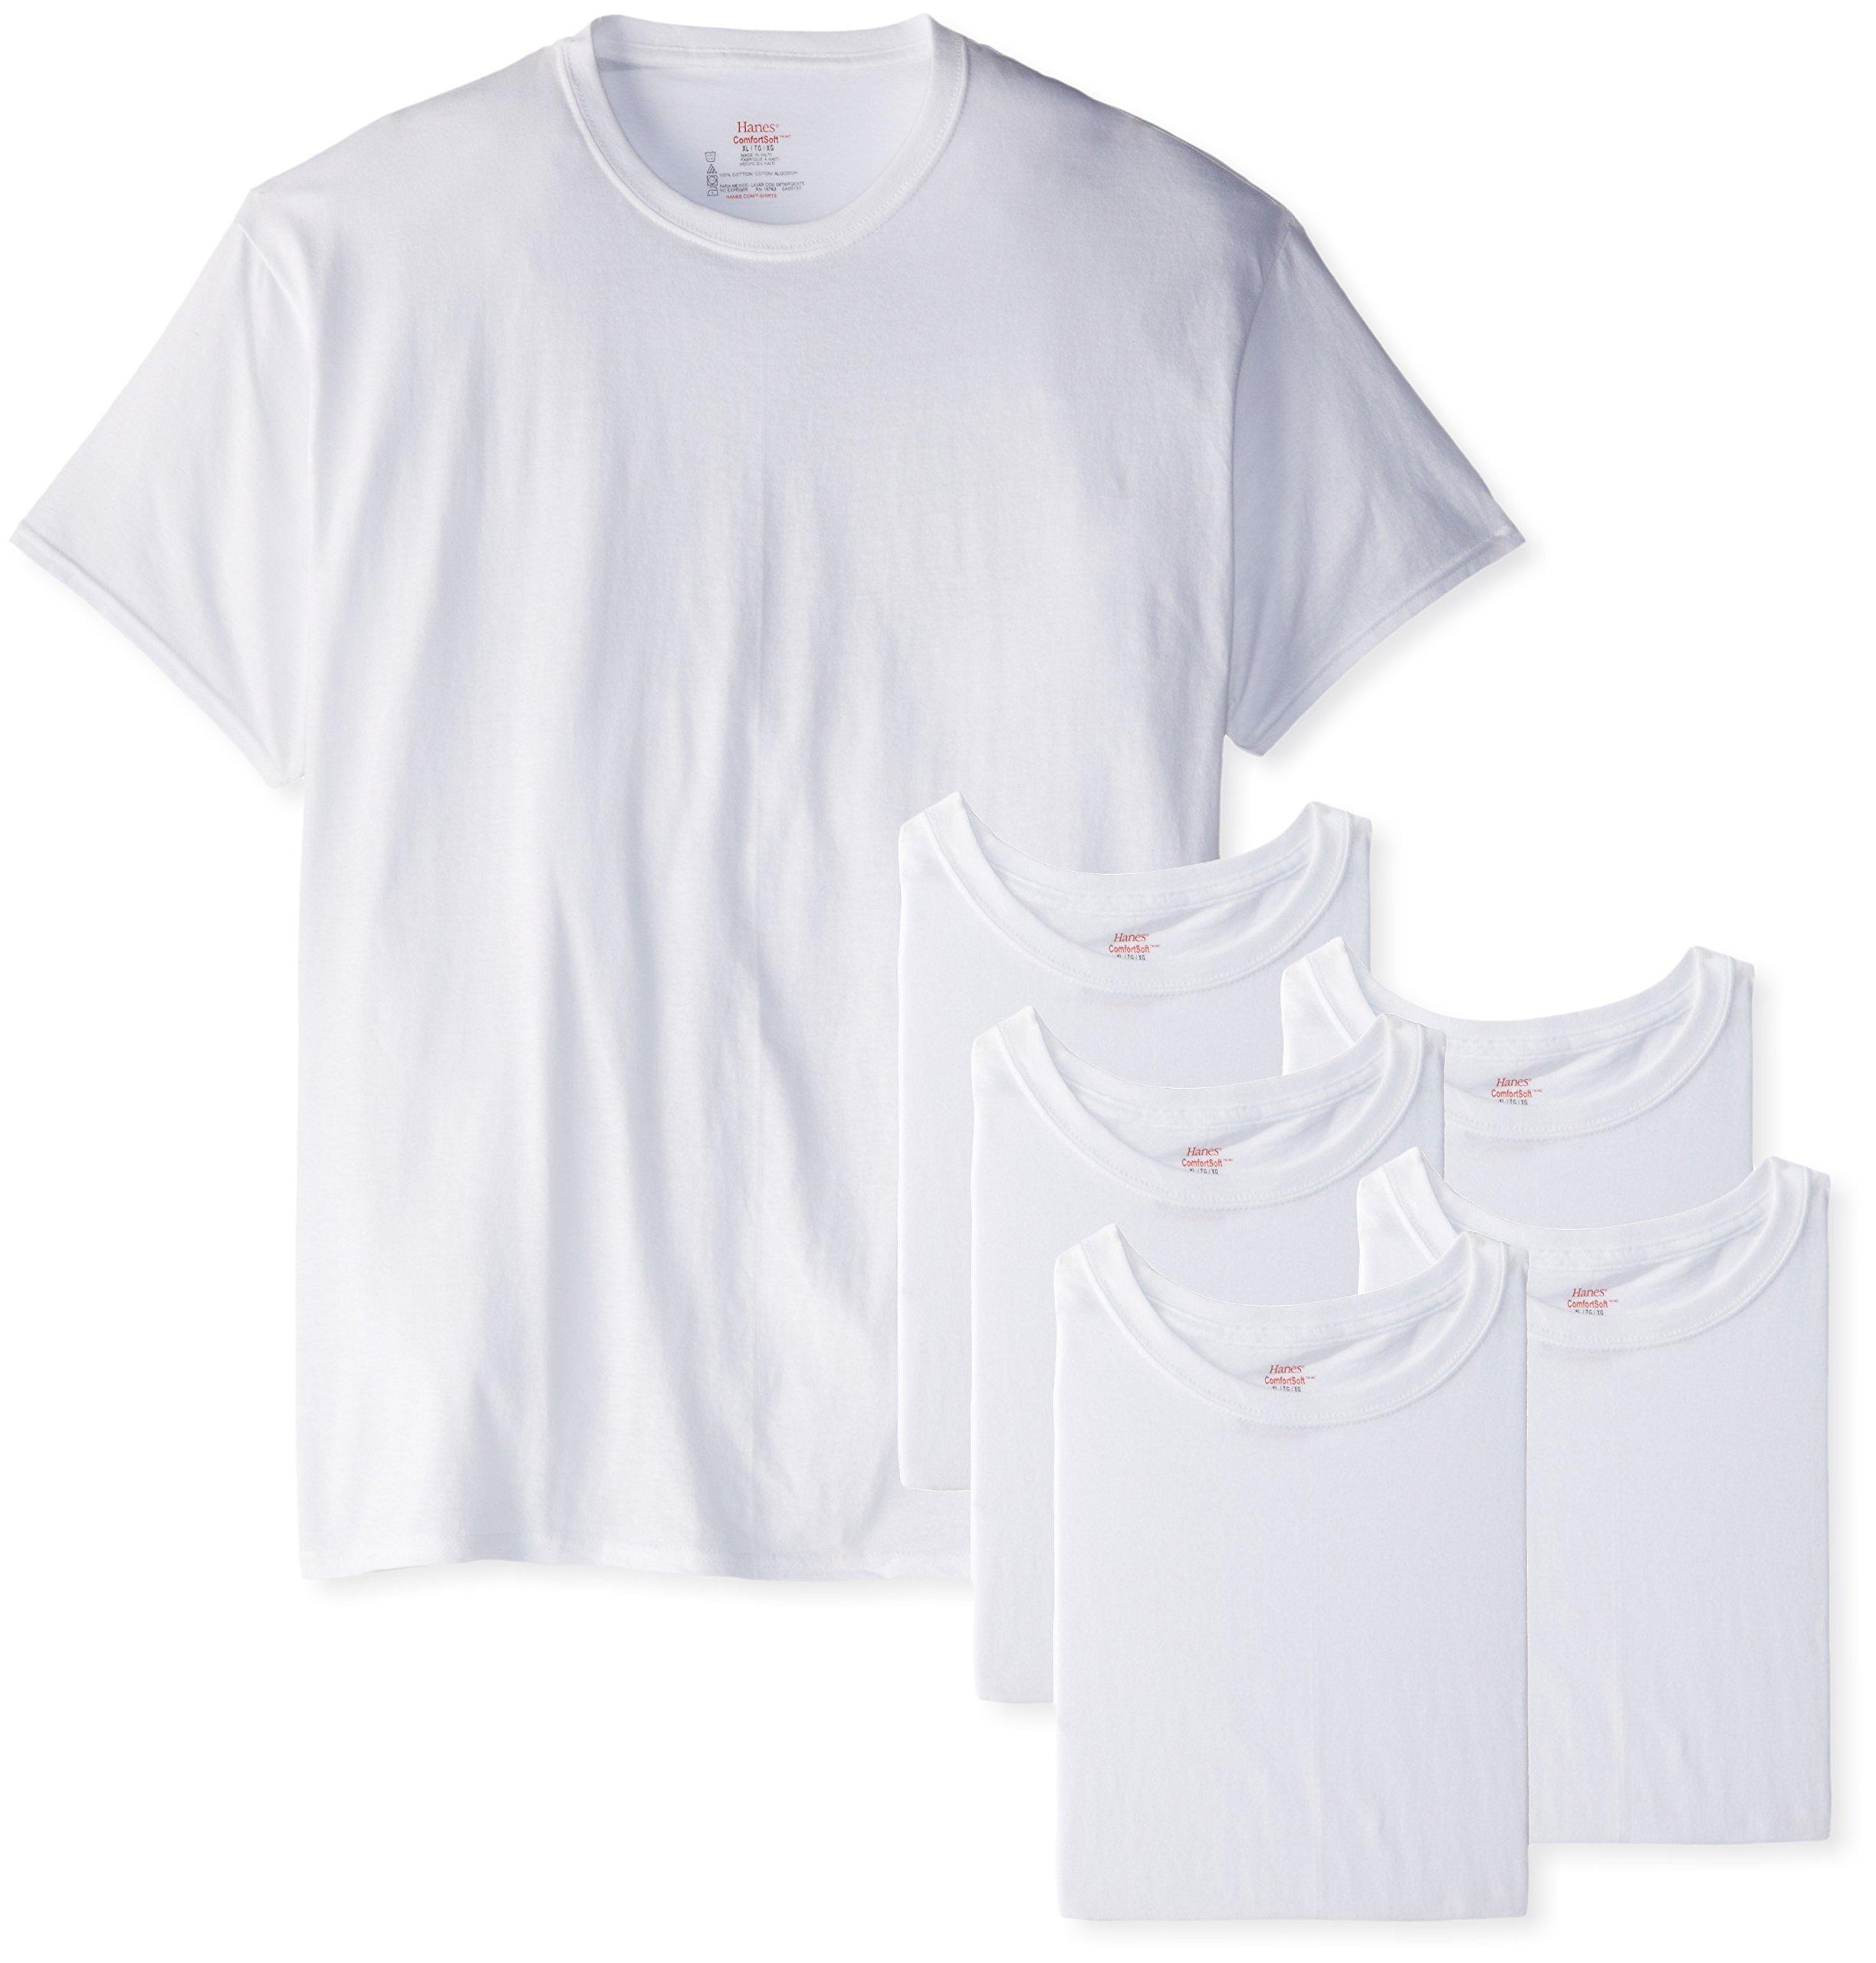 Hanes Men's 6-Pack FreshIQ Crew T-Shirt, White, Large by Hanes